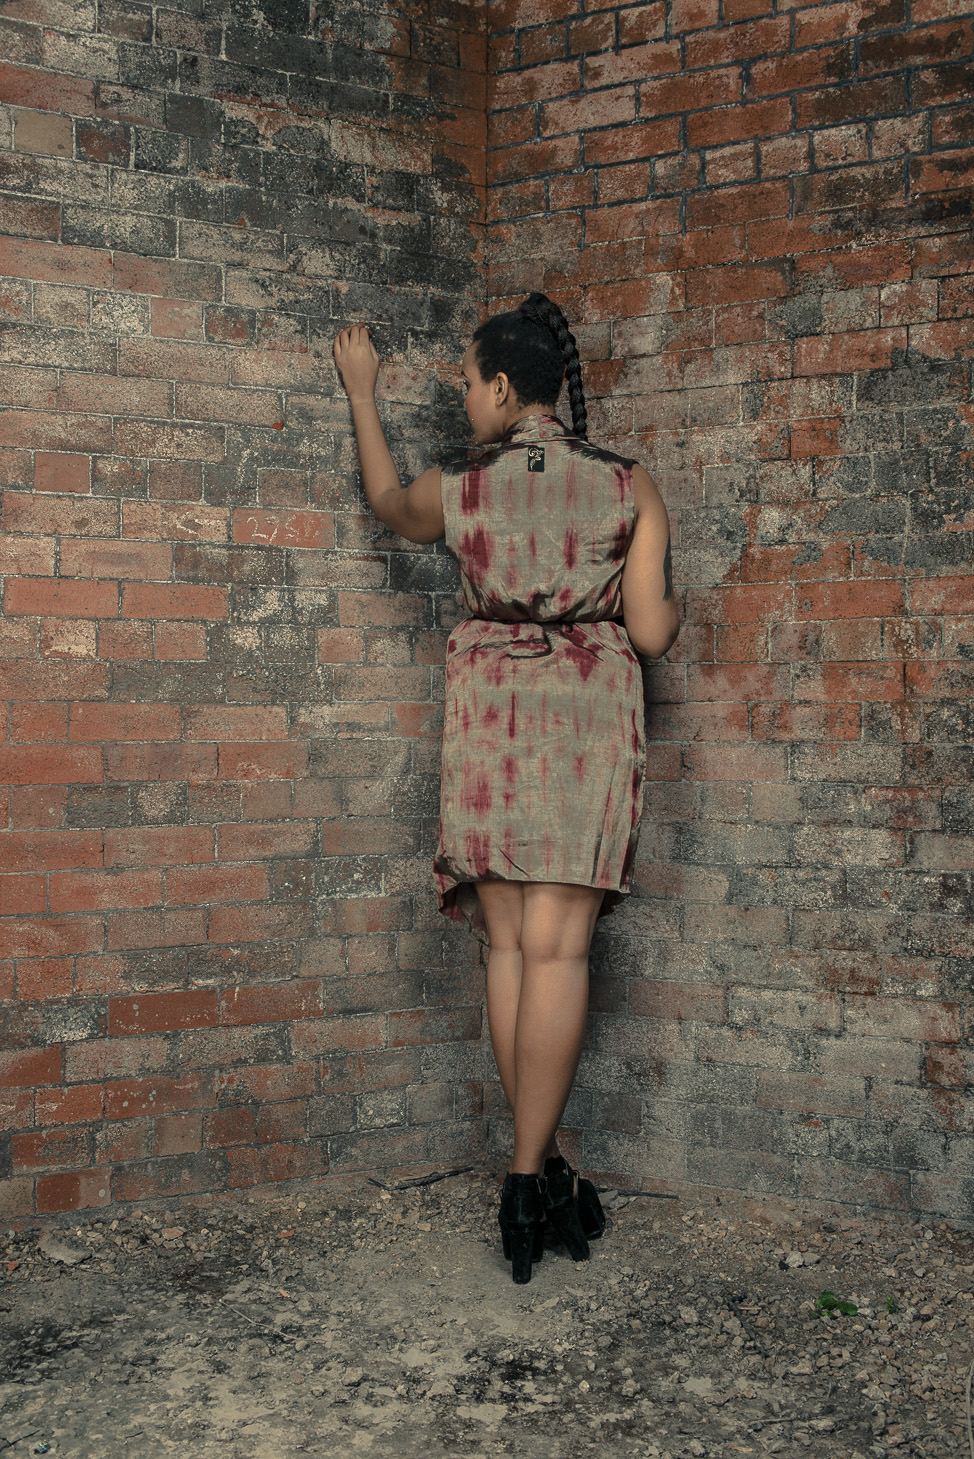 zaramia-ava-zaramiaava-leeds-fashion-designer-ethical-sustainable-tailored-minimalist-dress-emi-jacket-versatile-drape-print-bodysuit-black-obi-belt-wrap-cowl-styling-womenswear-models-photoshoot-29